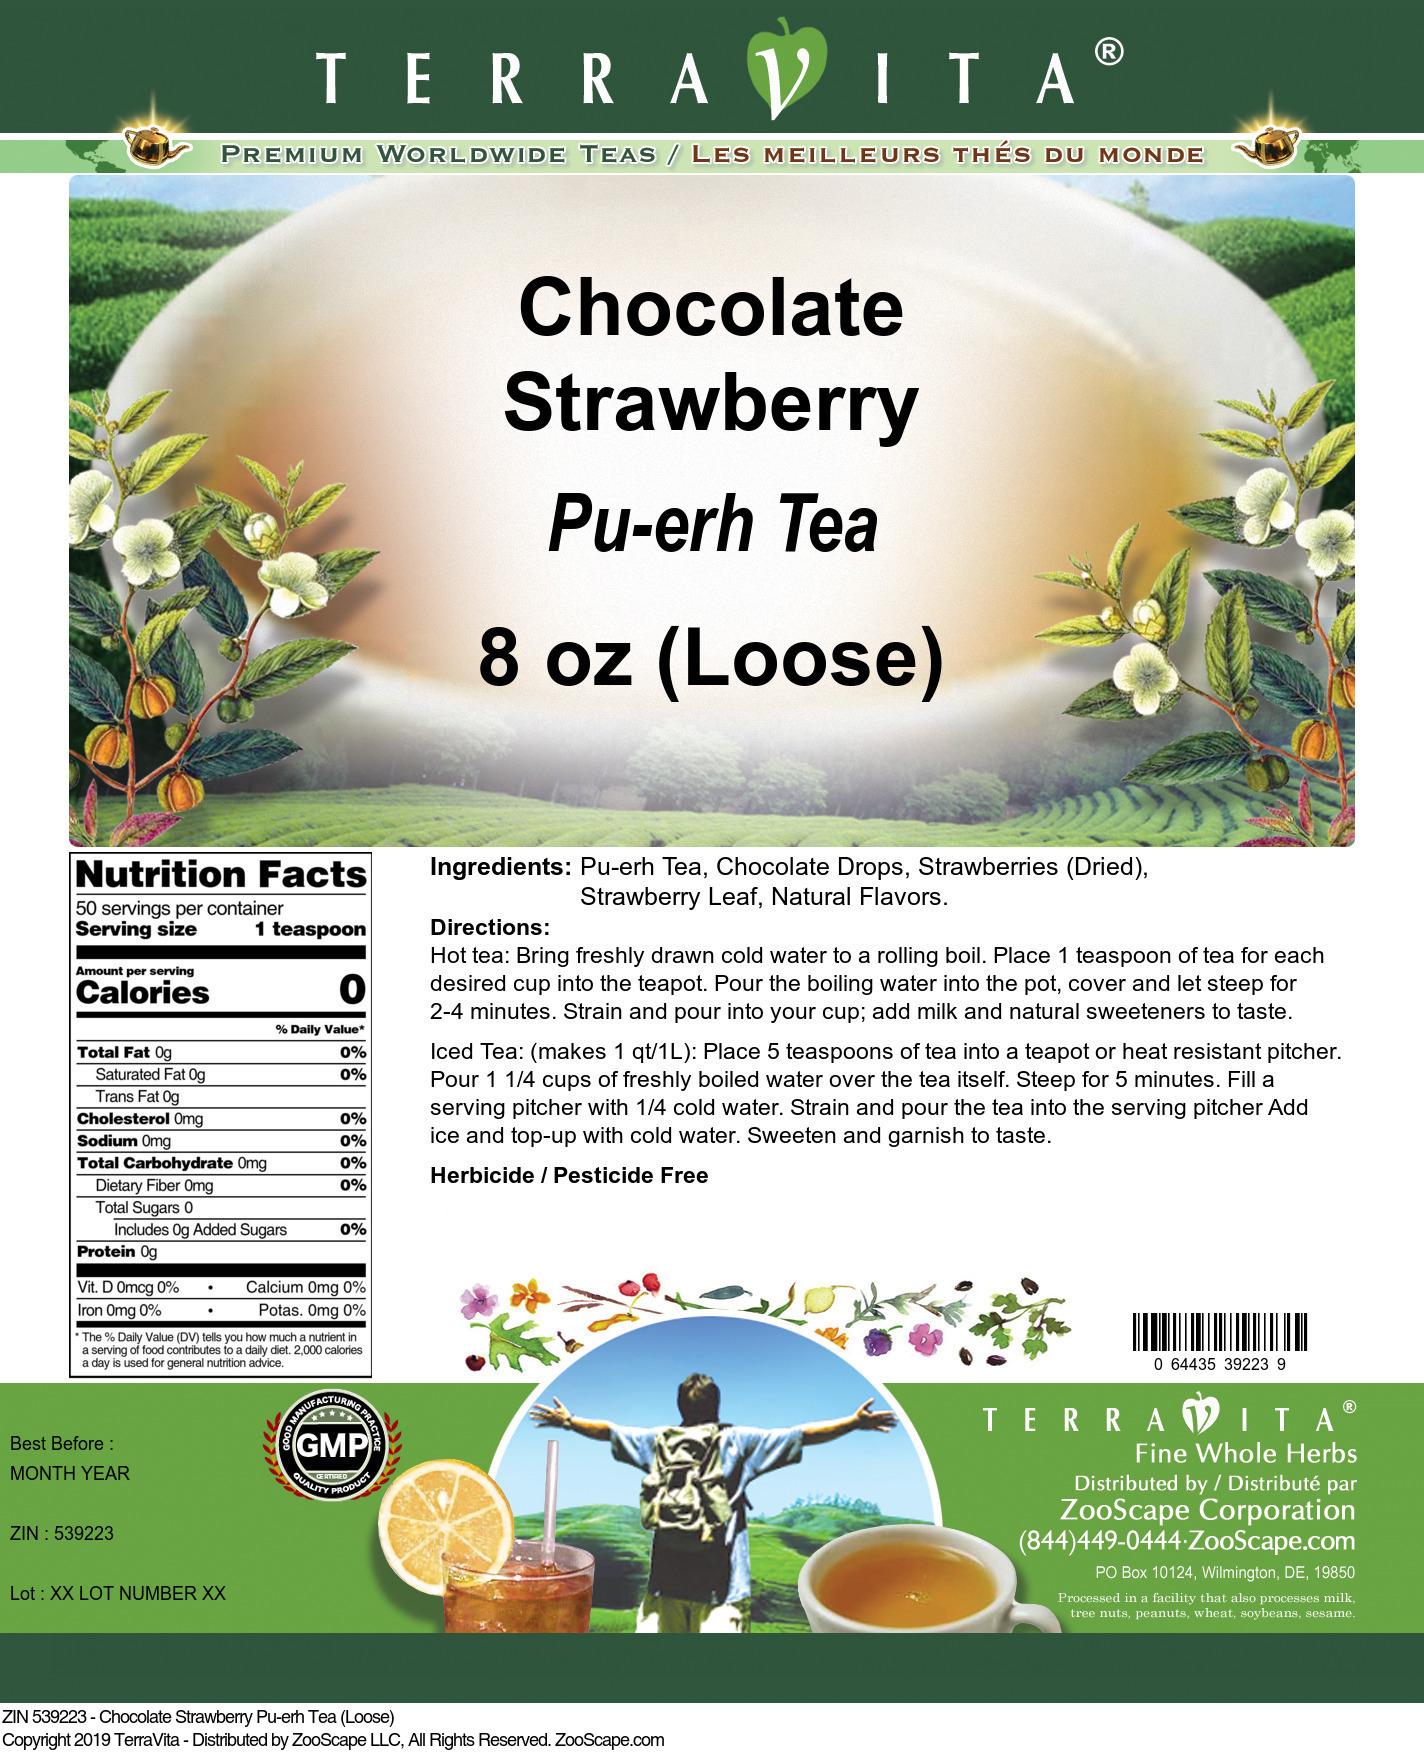 Chocolate Strawberry Pu-erh Tea (Loose)